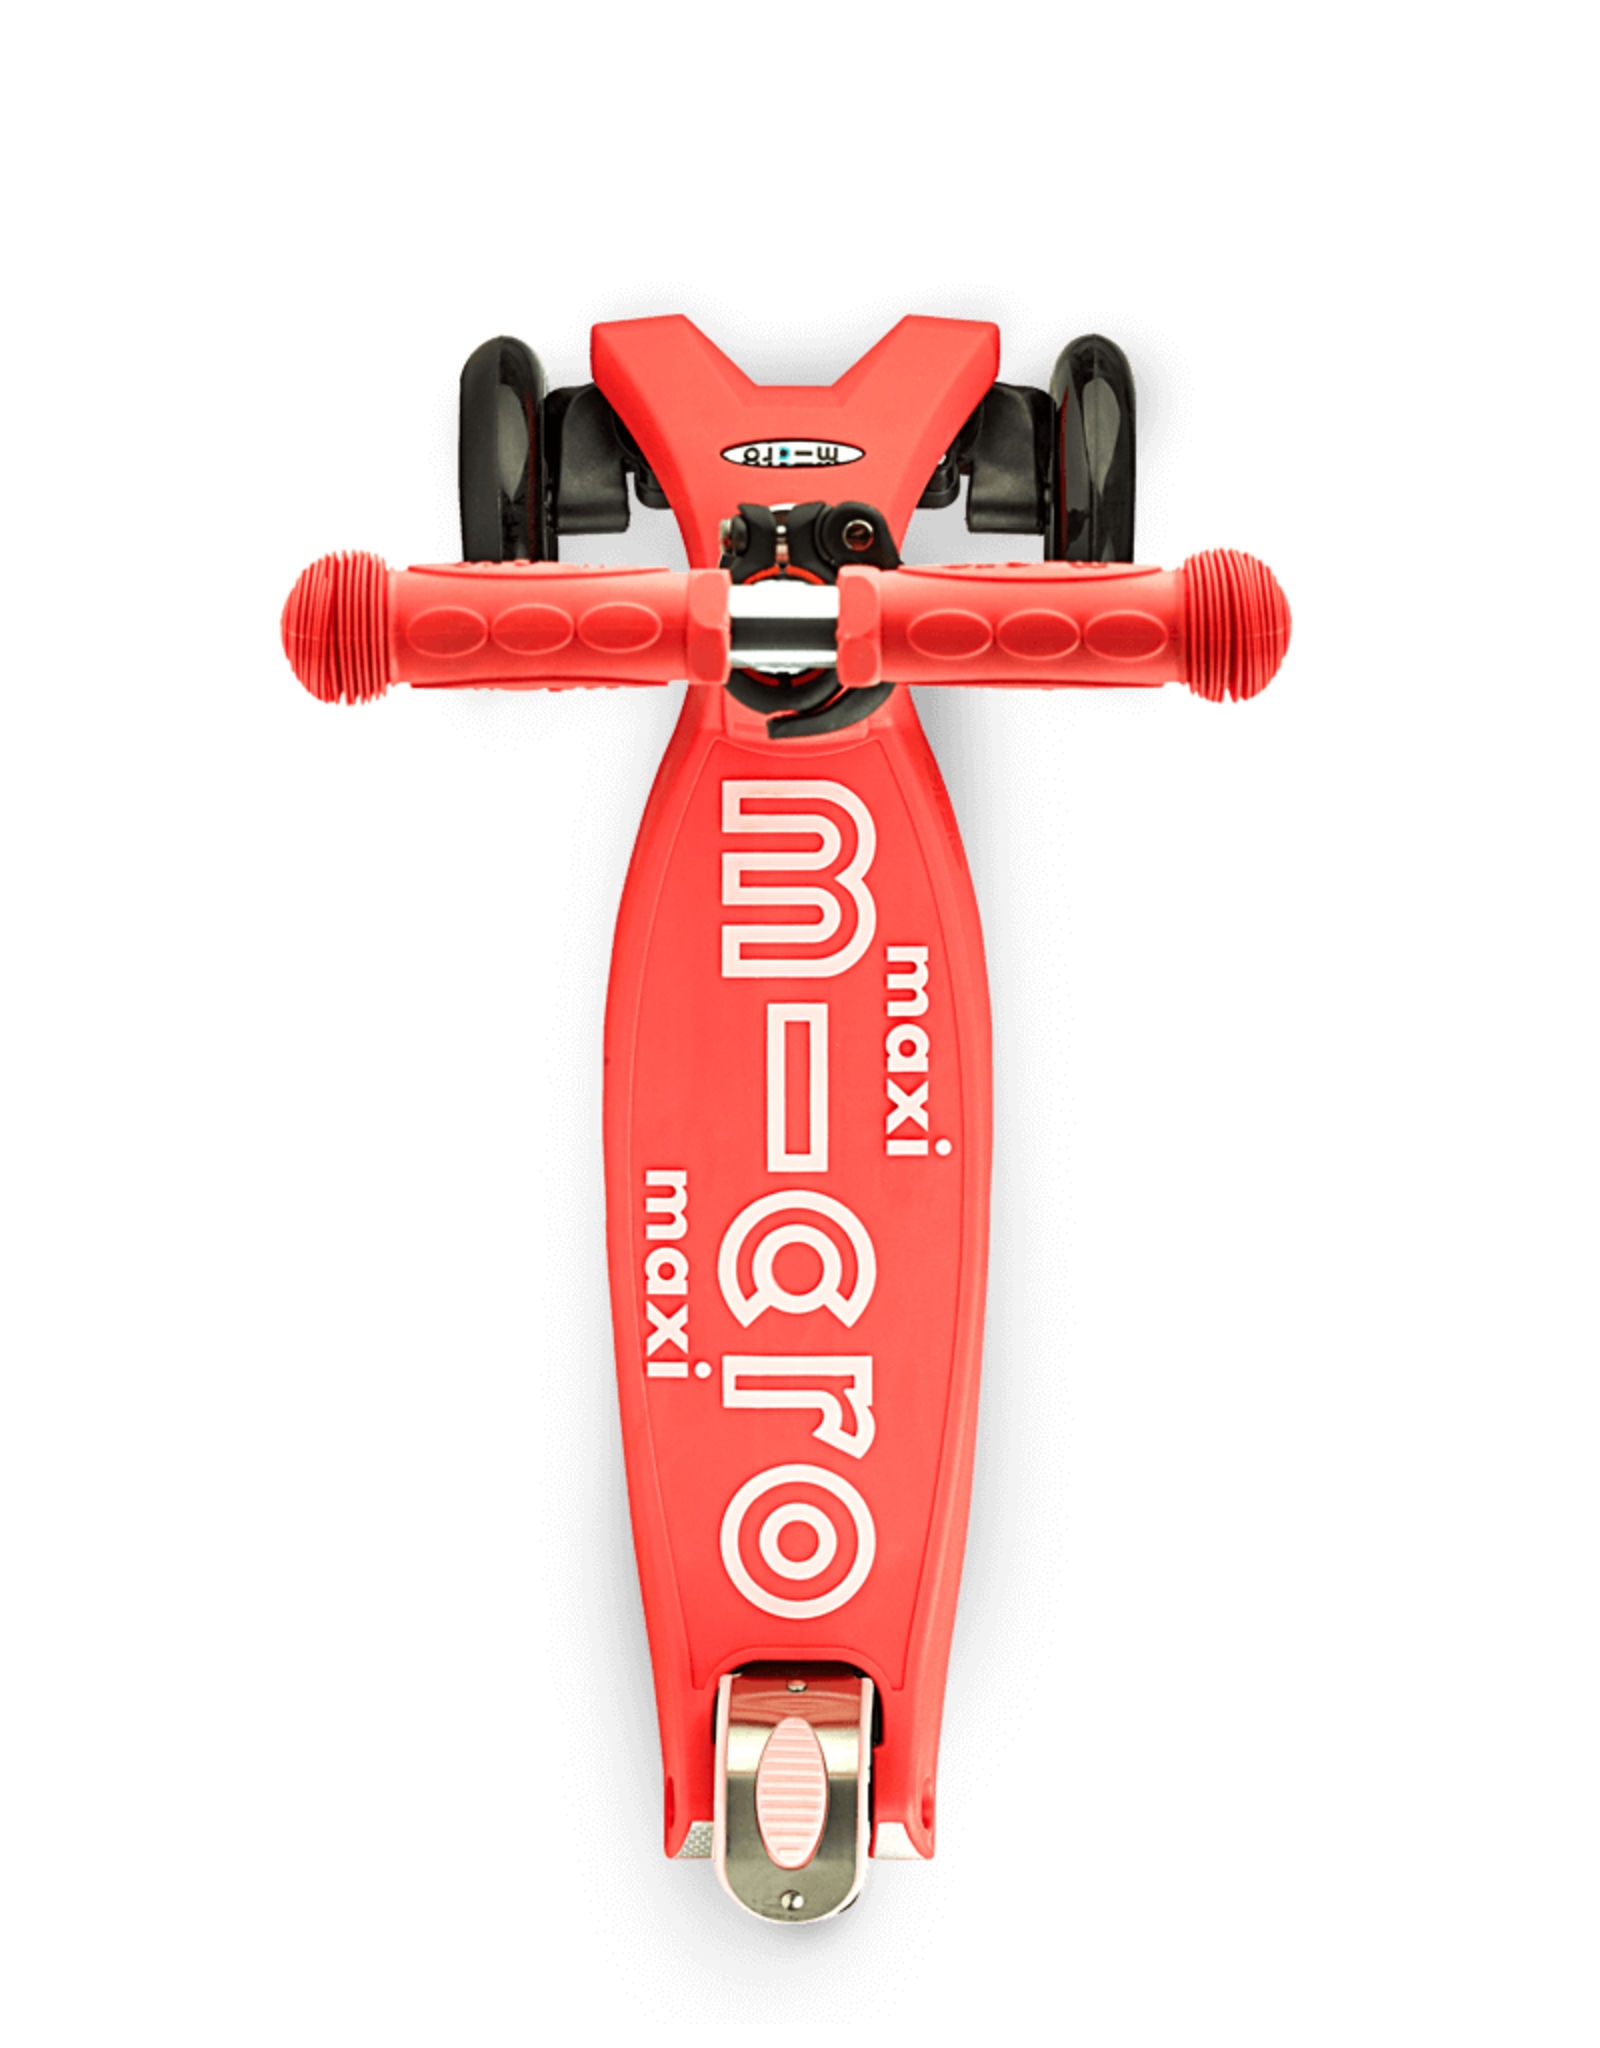 Kickboard MAXI MICRO DELUXE FOLDING KICKBOARD - BRIGHT CORAL